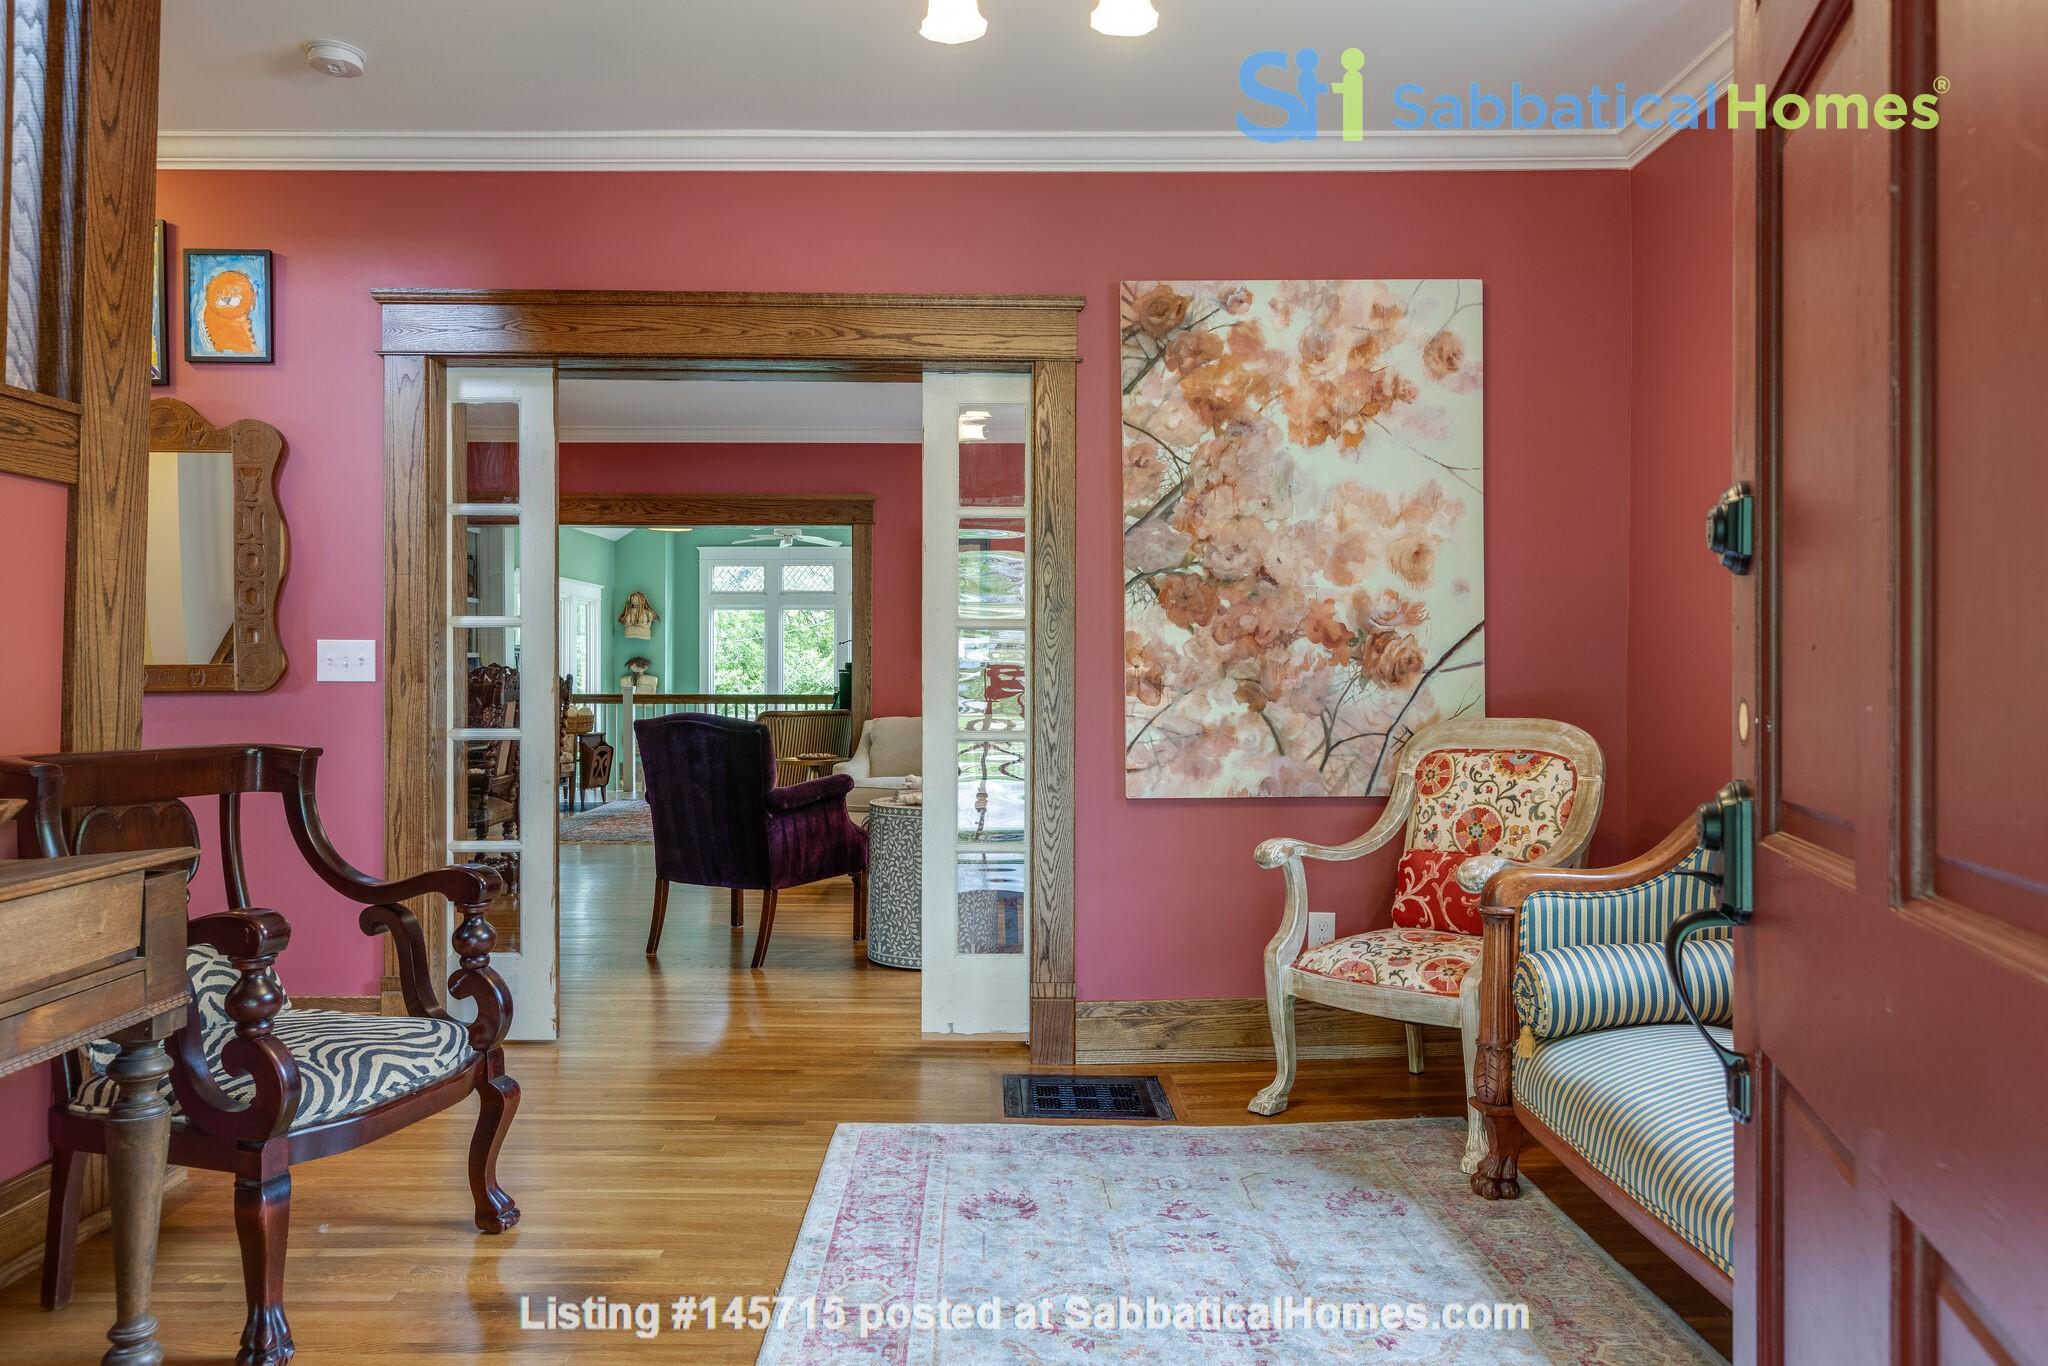 5 BR/3 + 2 BA Historic gem in Belmont-Hillsboro Home Rental in Nashville 2